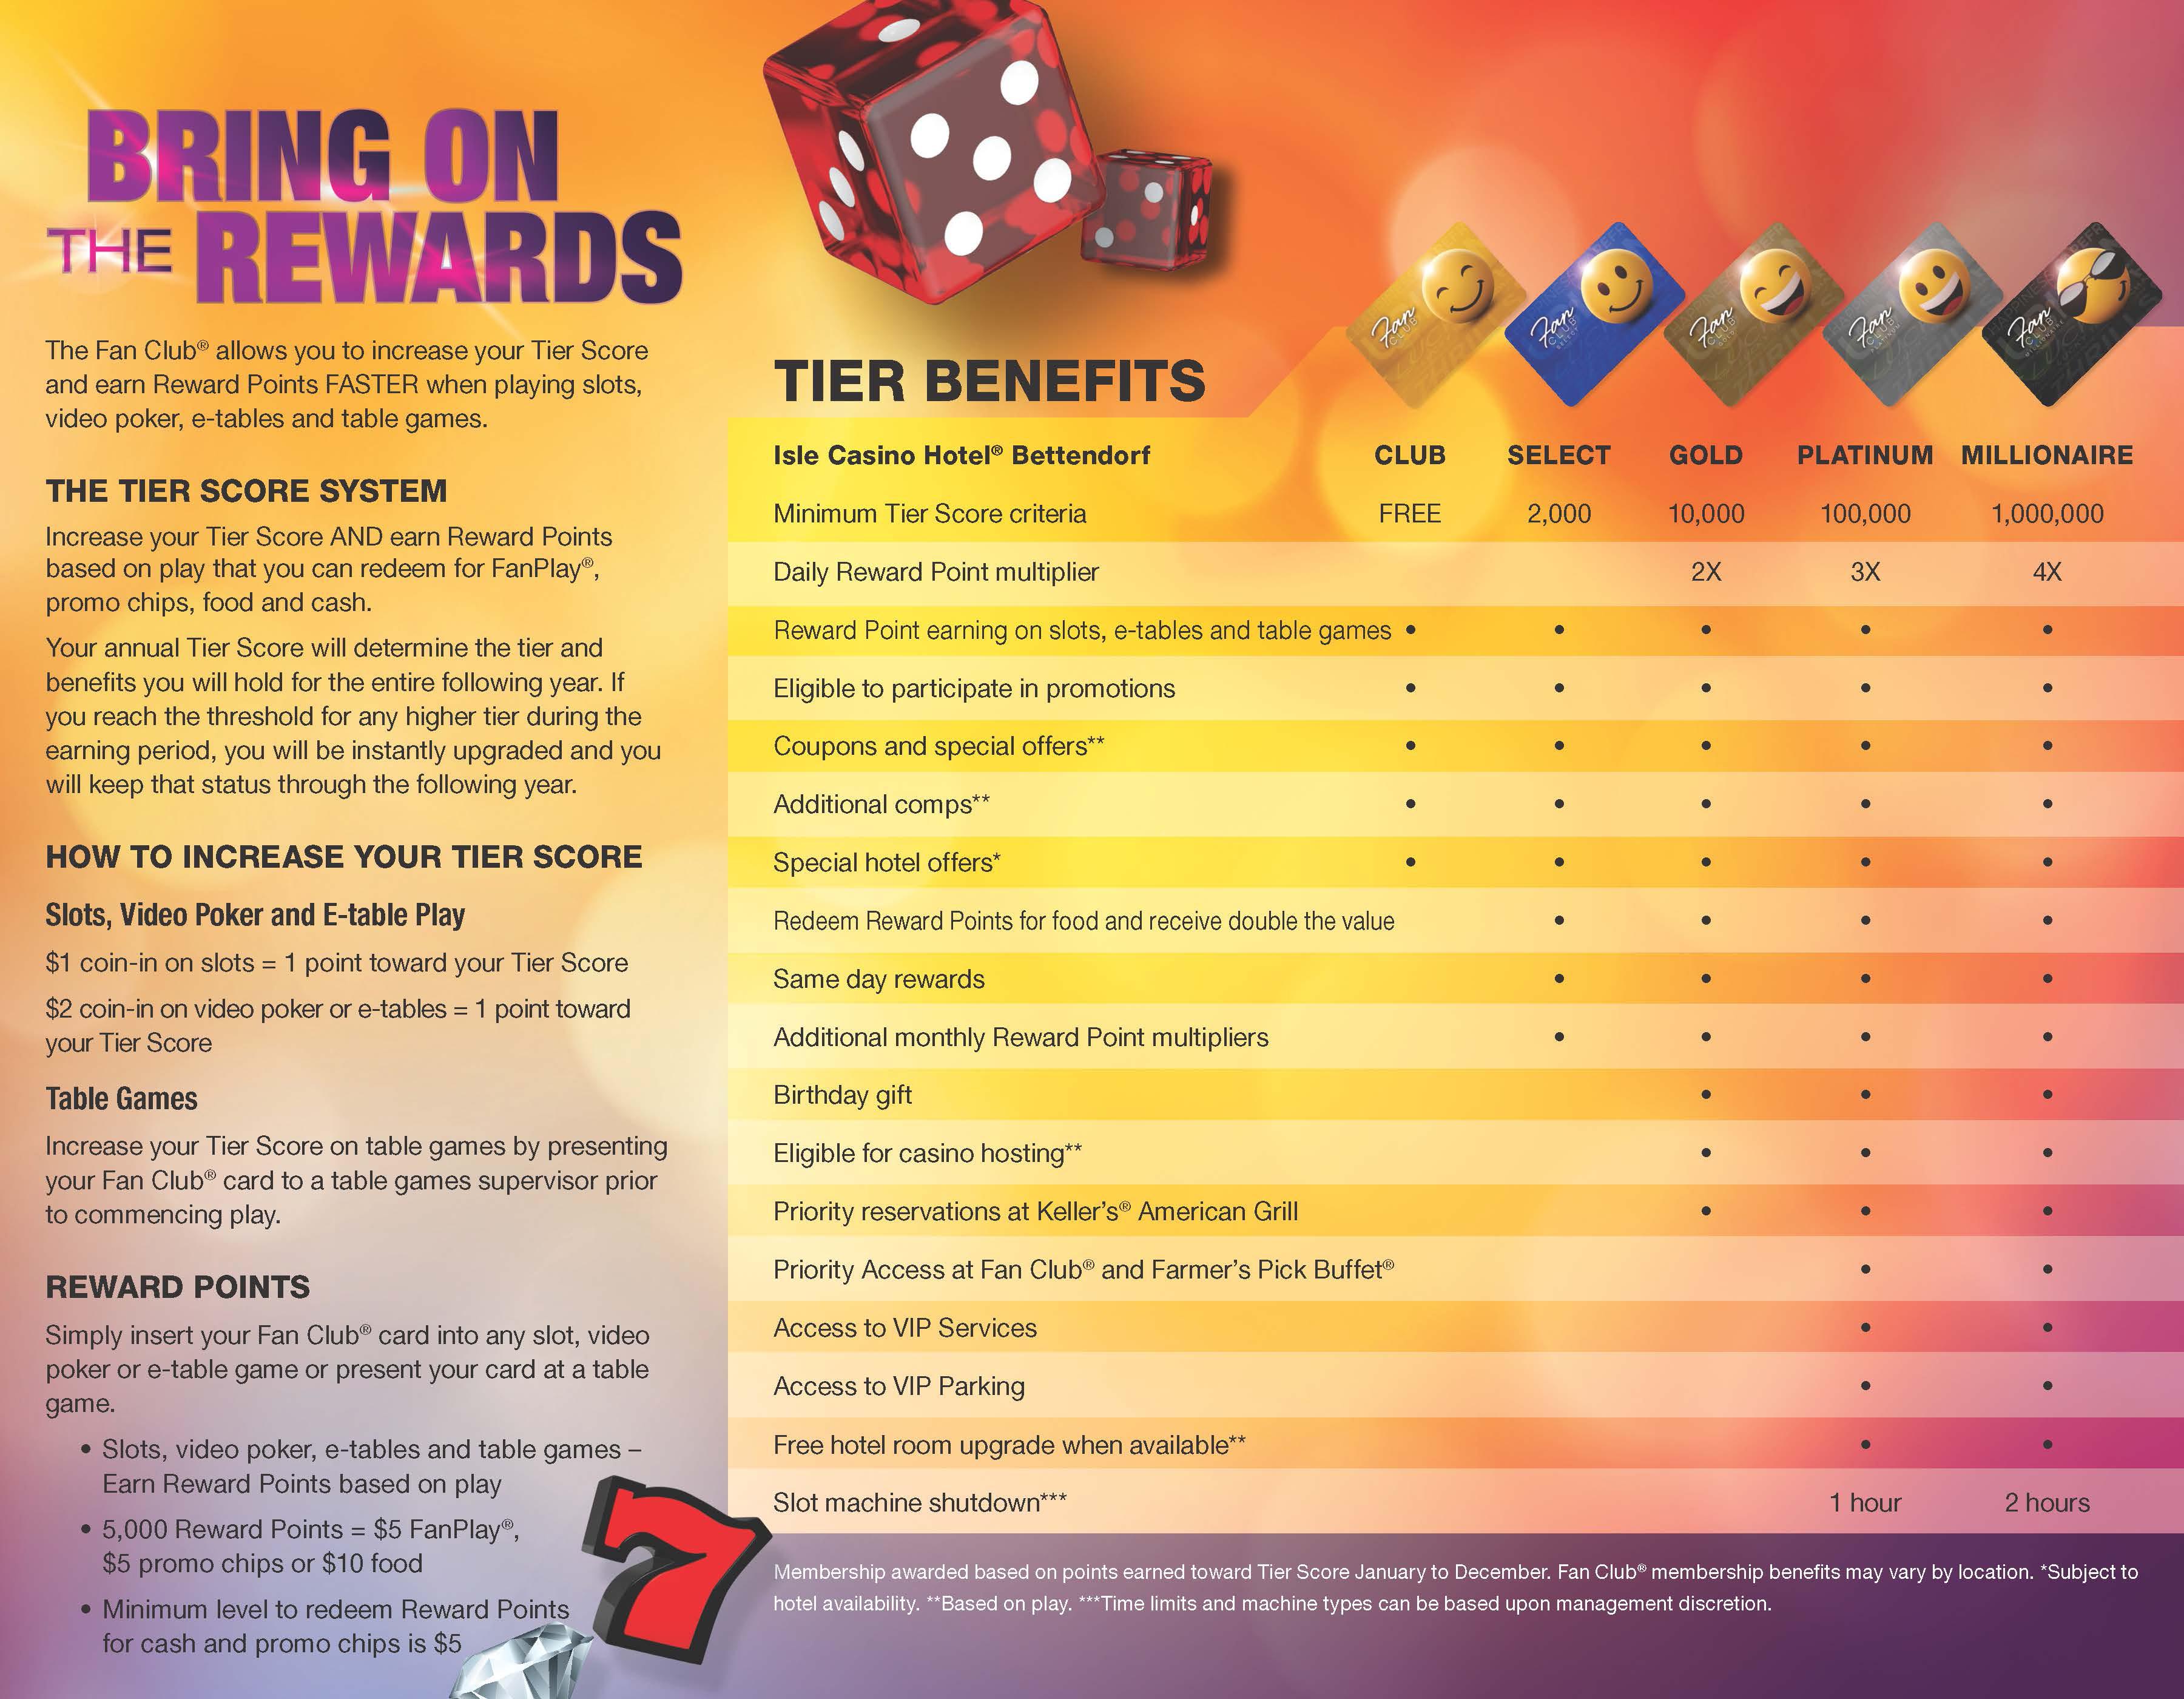 Fan Club Chart Explaining Rewards Tiers